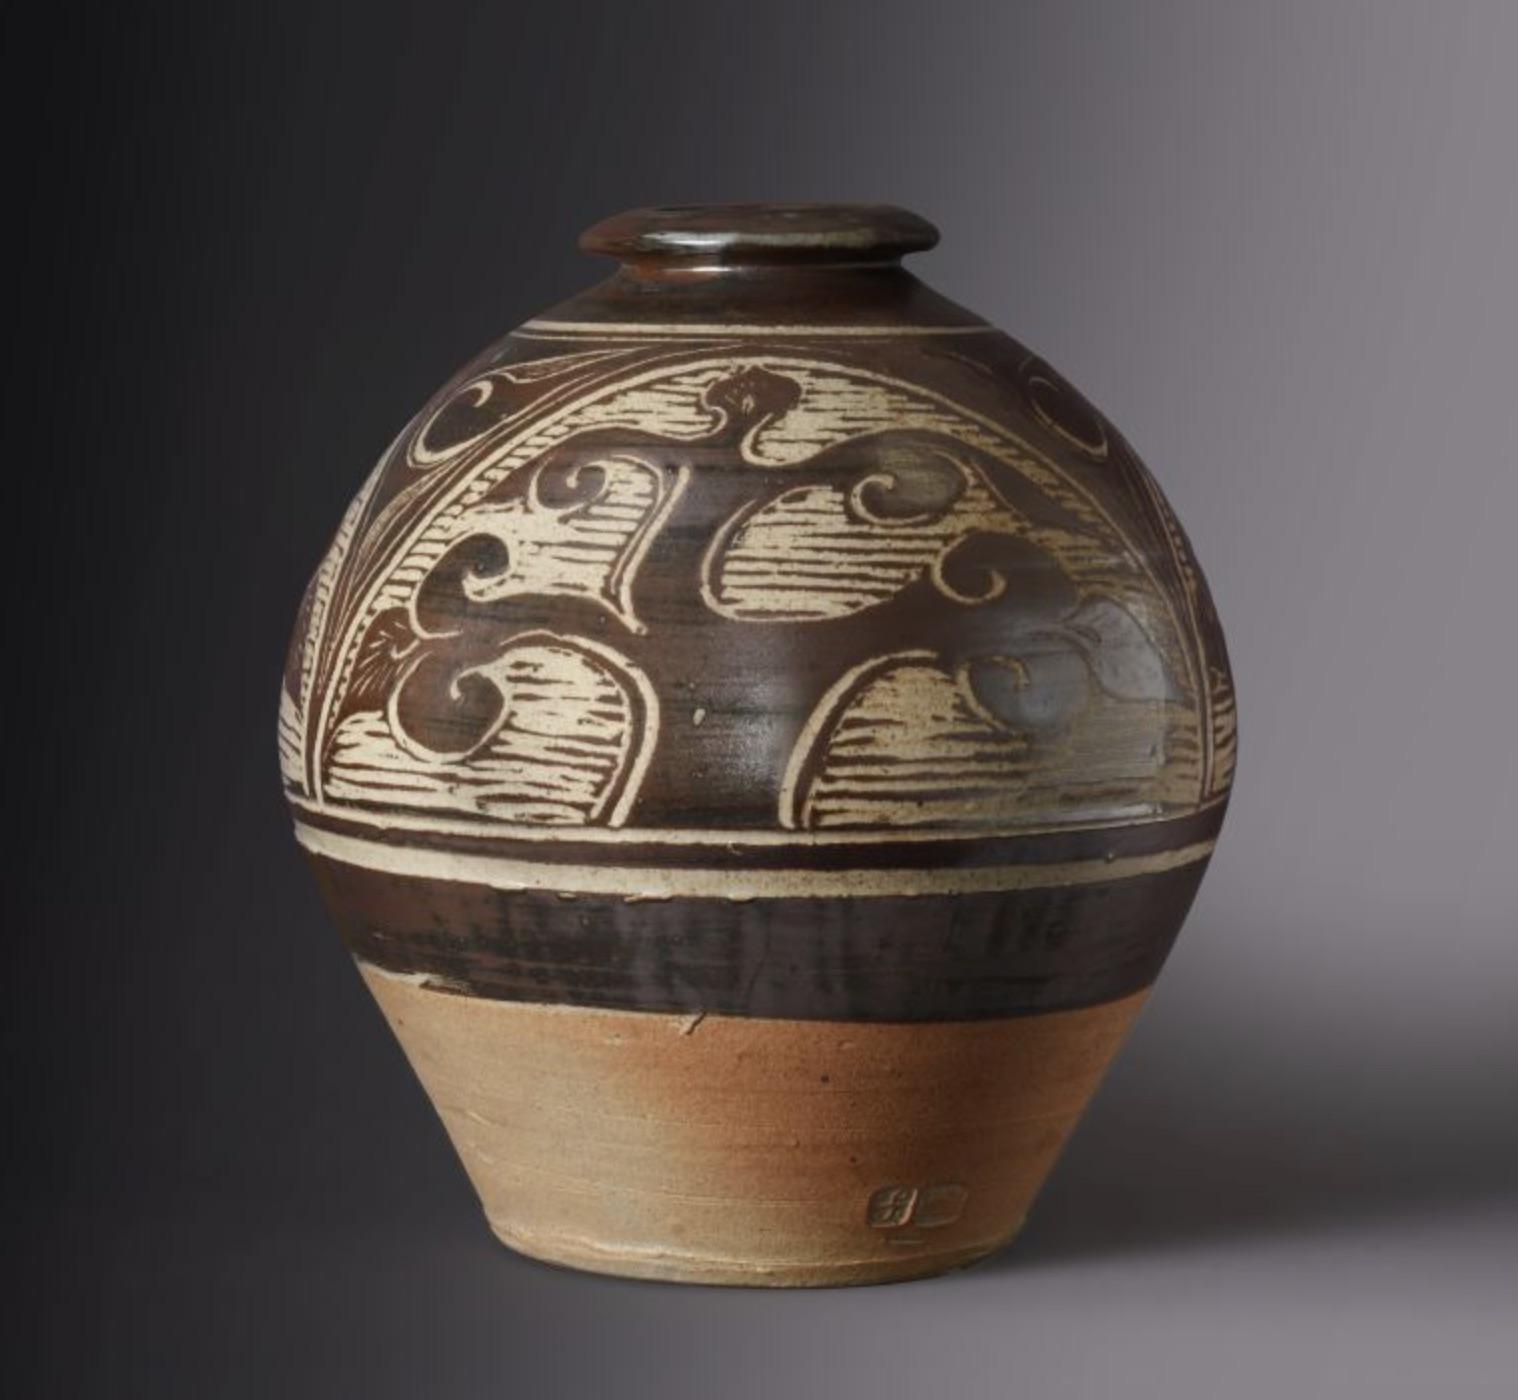 Bernard Leach Tree of Life vase